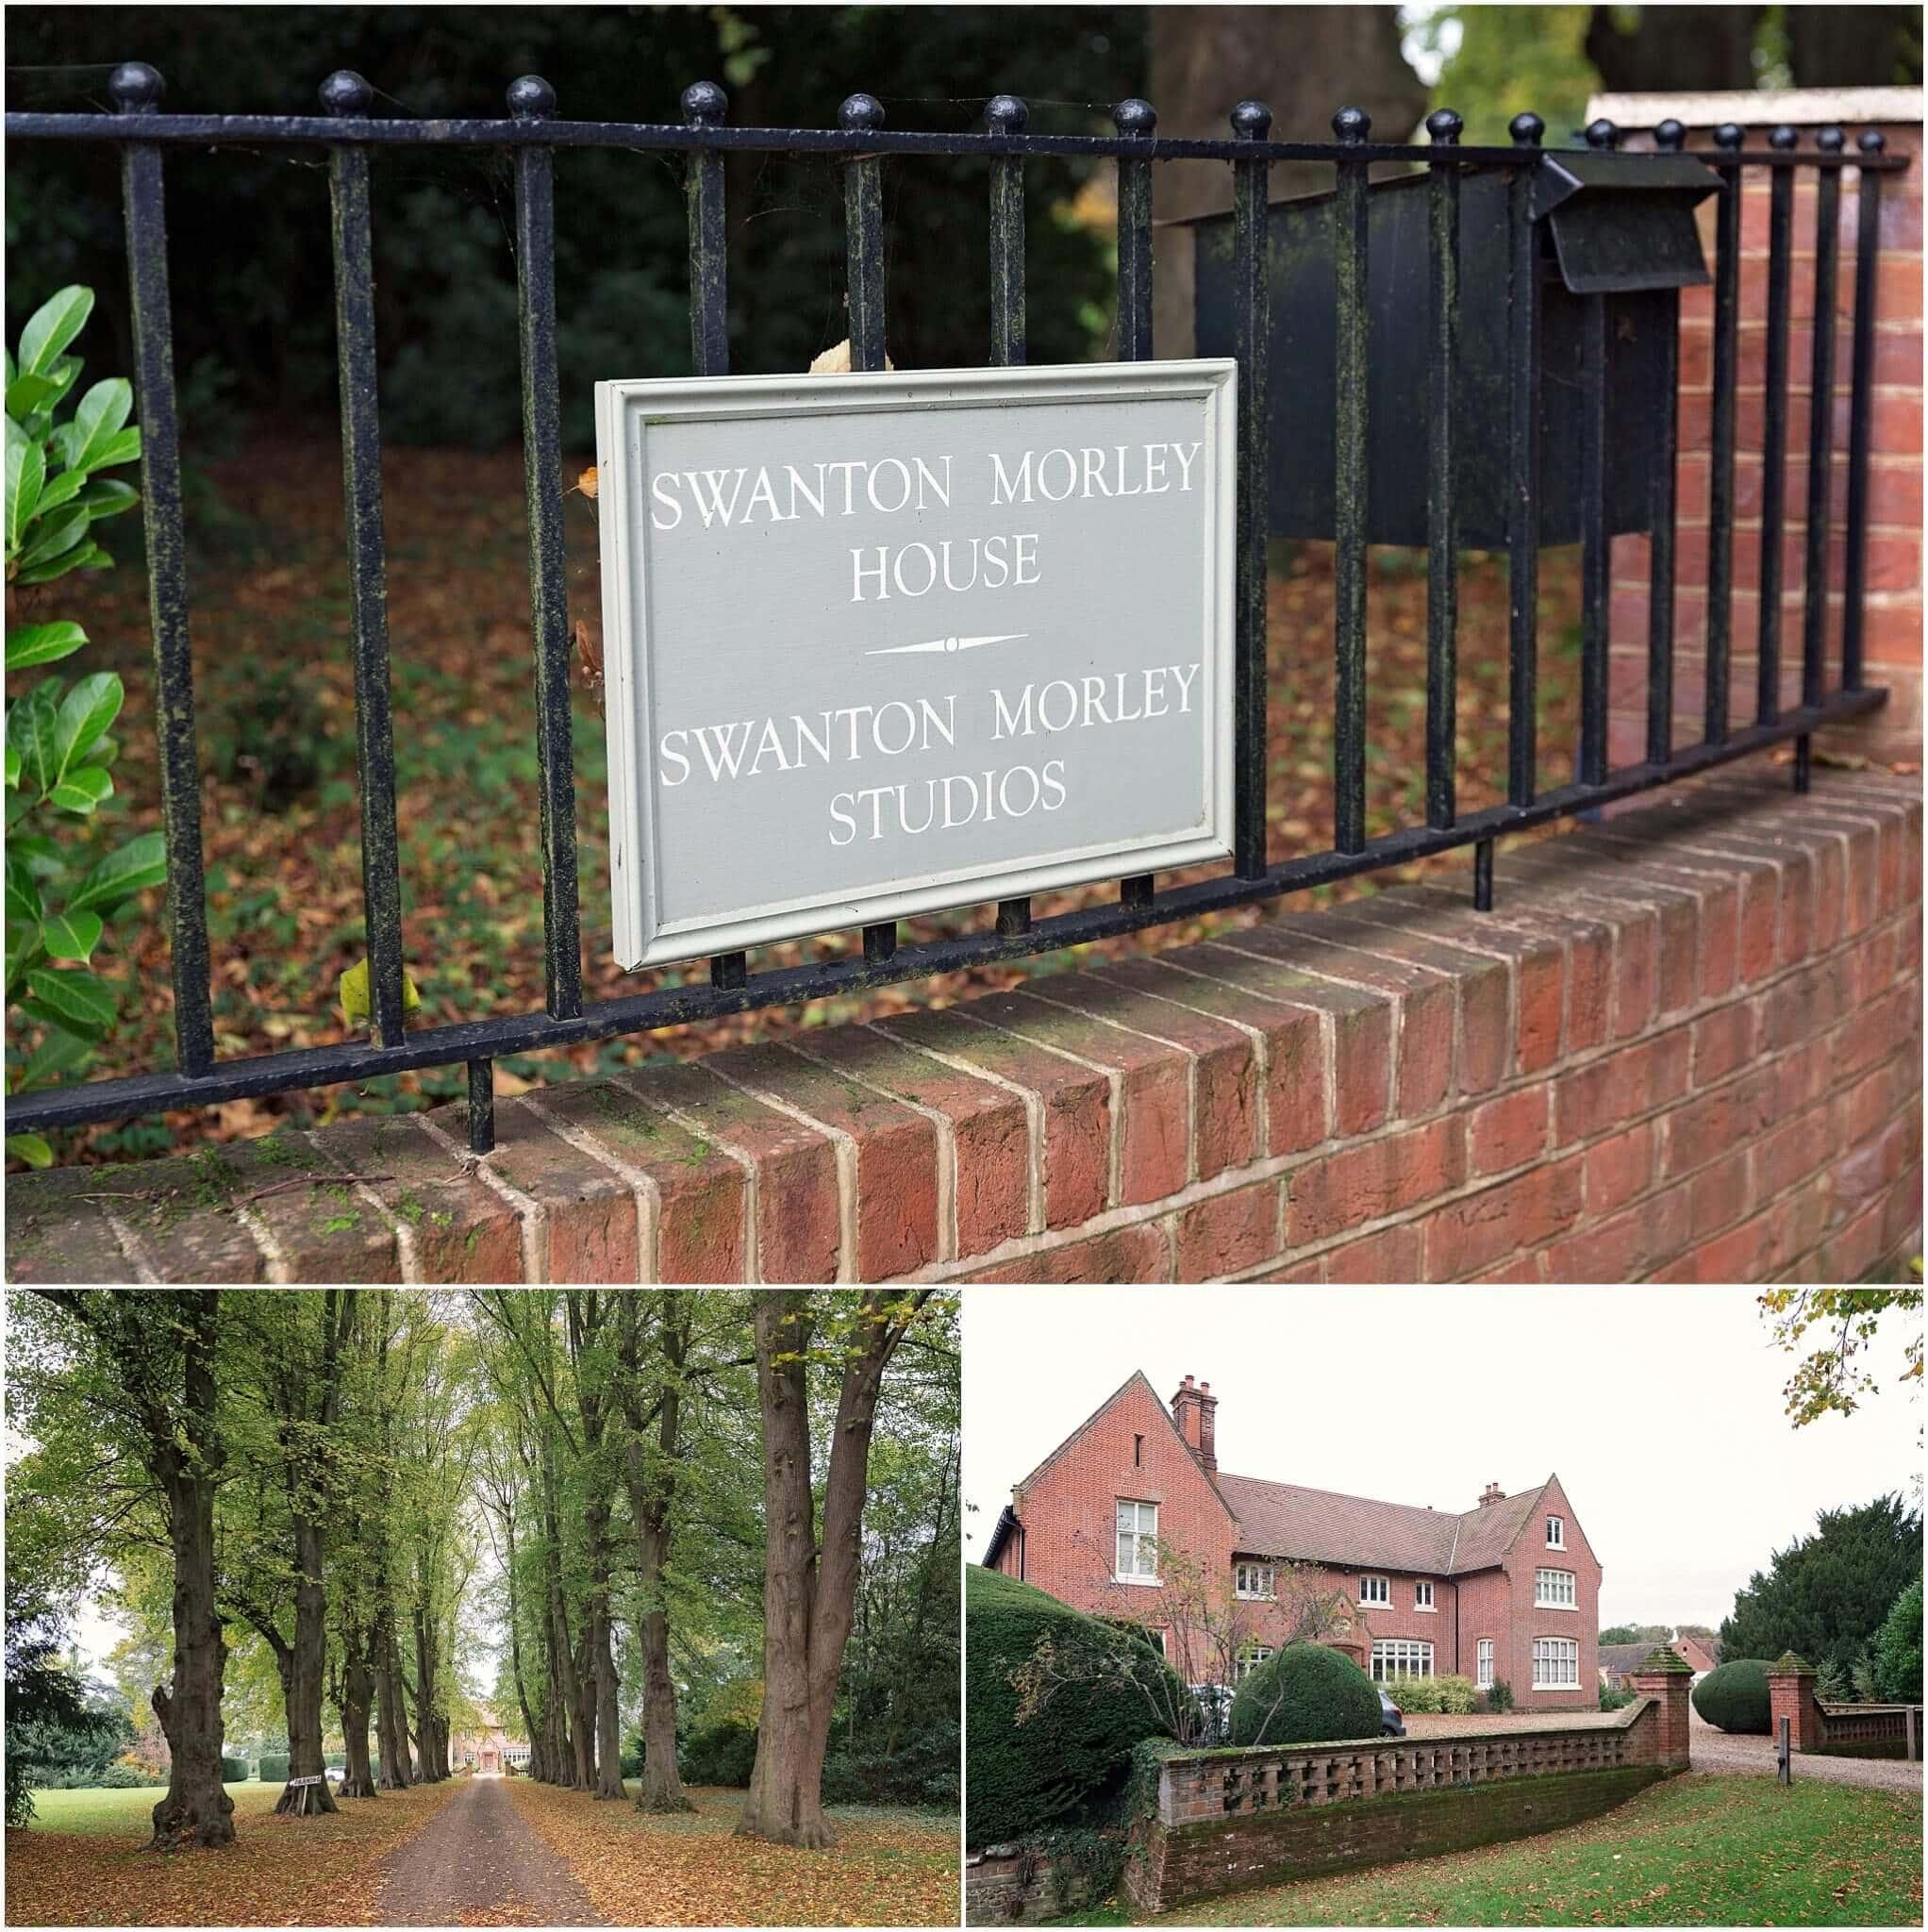 Swanton Morley House